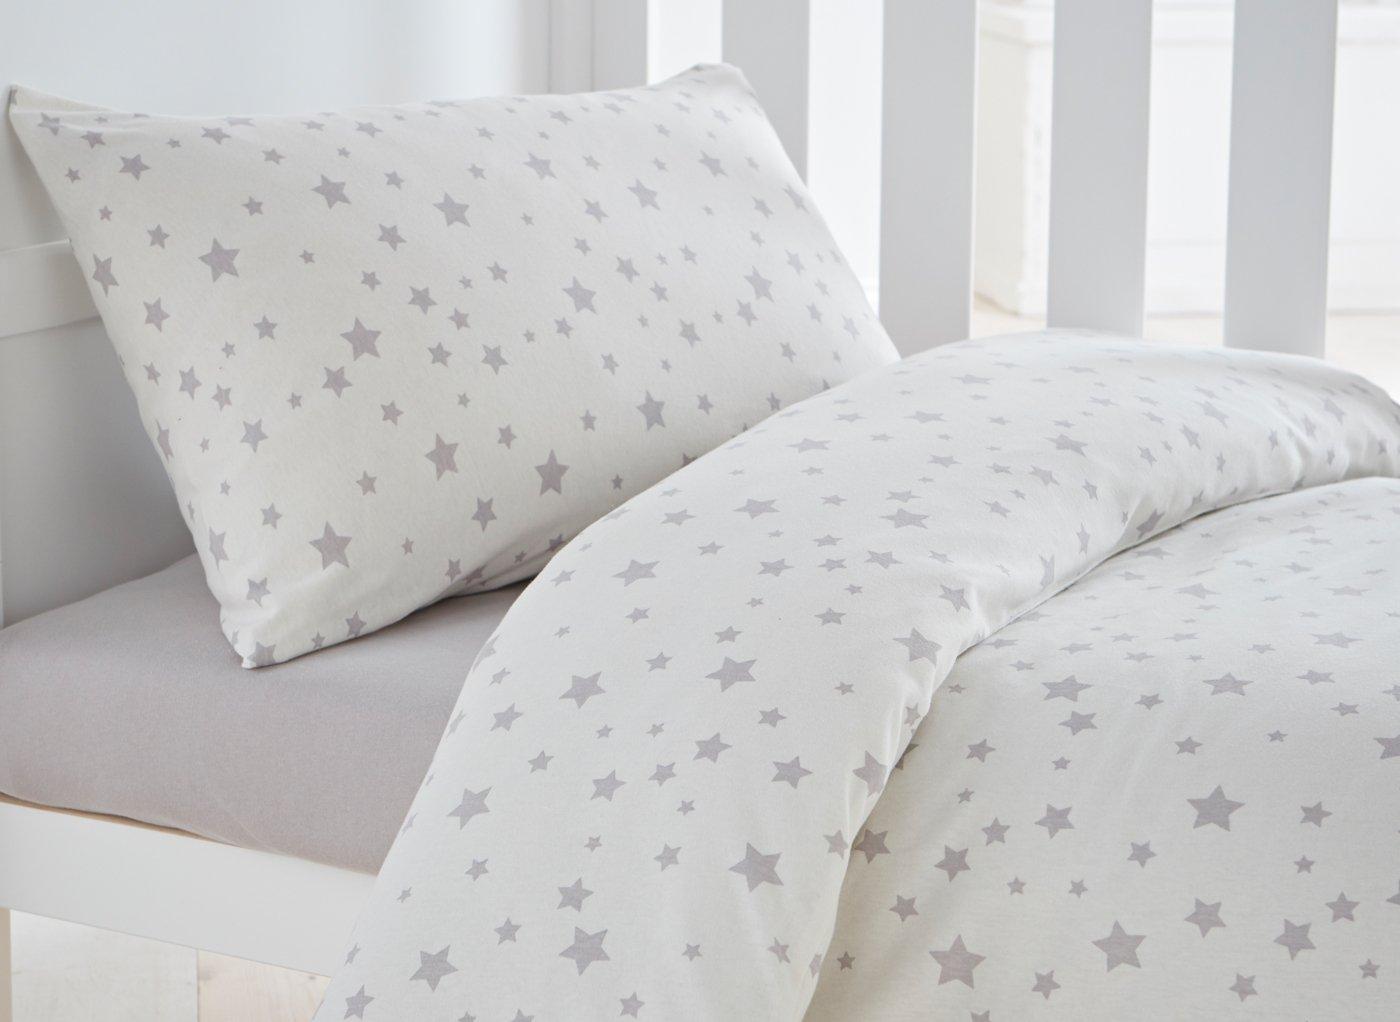 S'Night Jersey Star Duvet Set Cot Bed - Grey